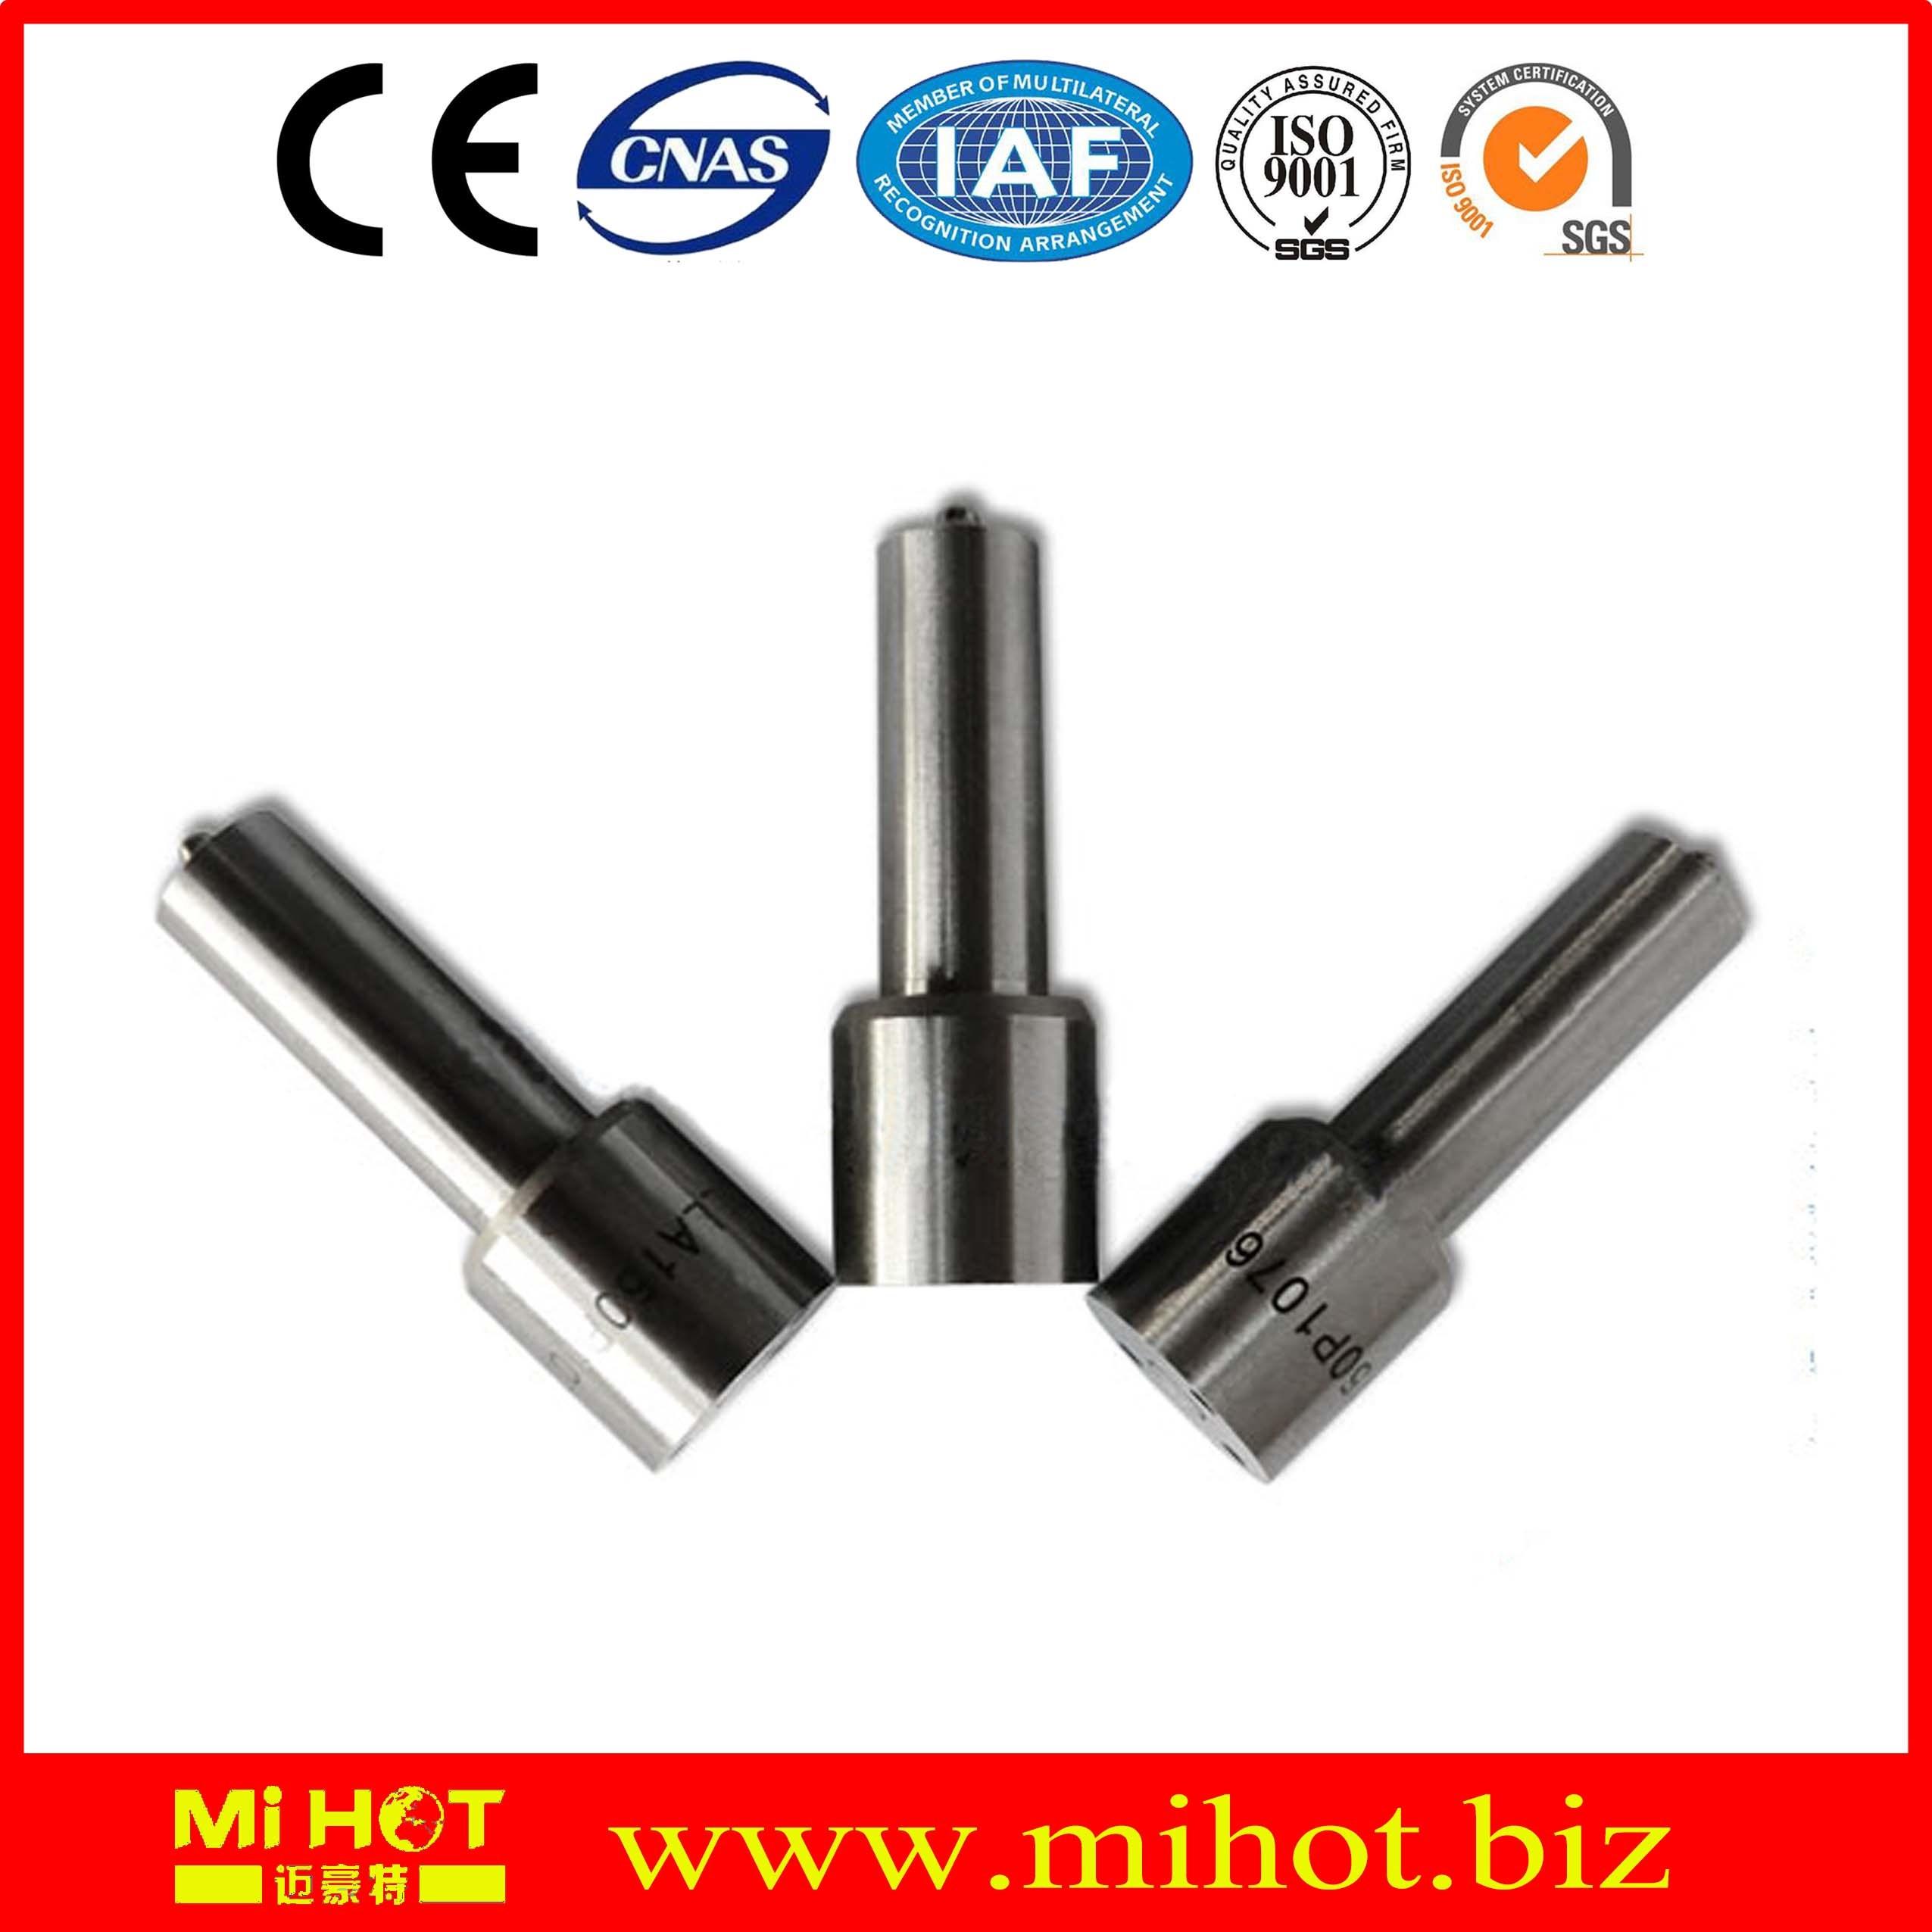 Common Rail Diesel Injector Nozzle Dlla155p965